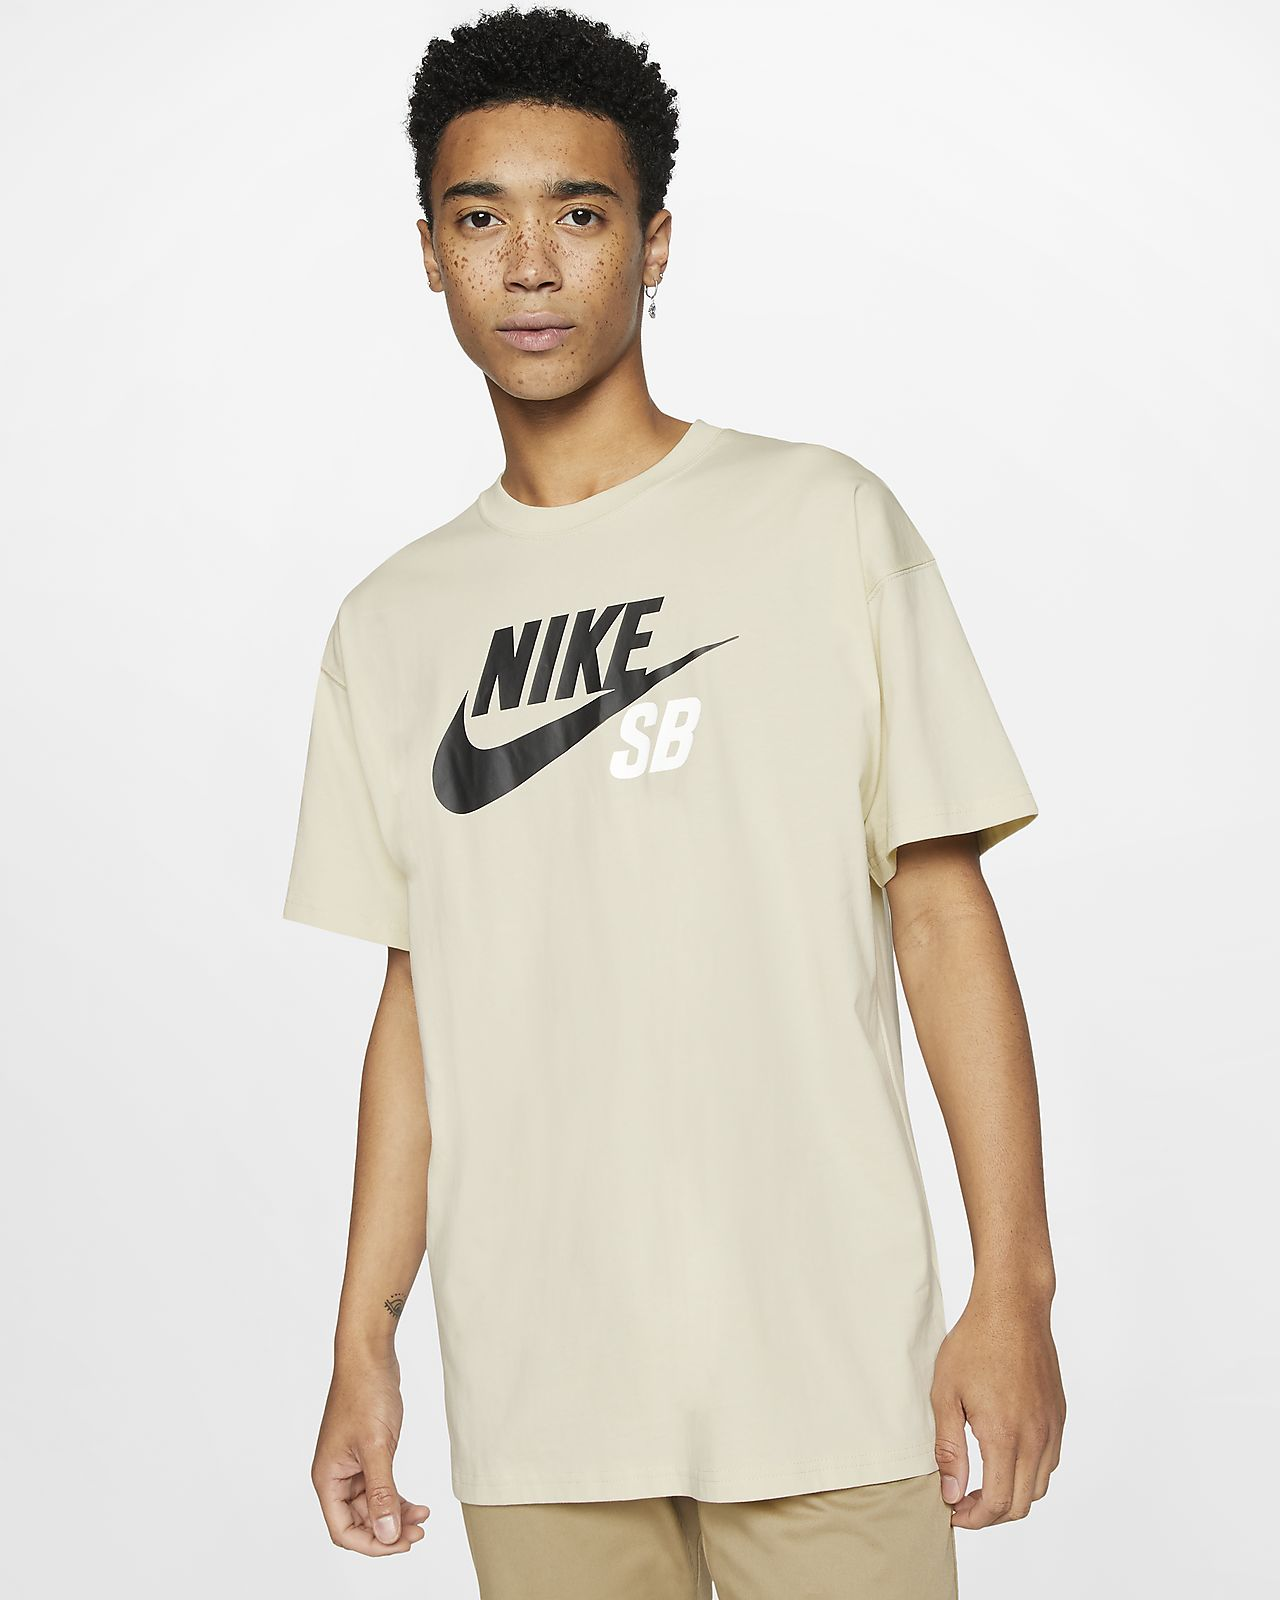 Męski T-shirt do skateboardingu z logo Nike SB